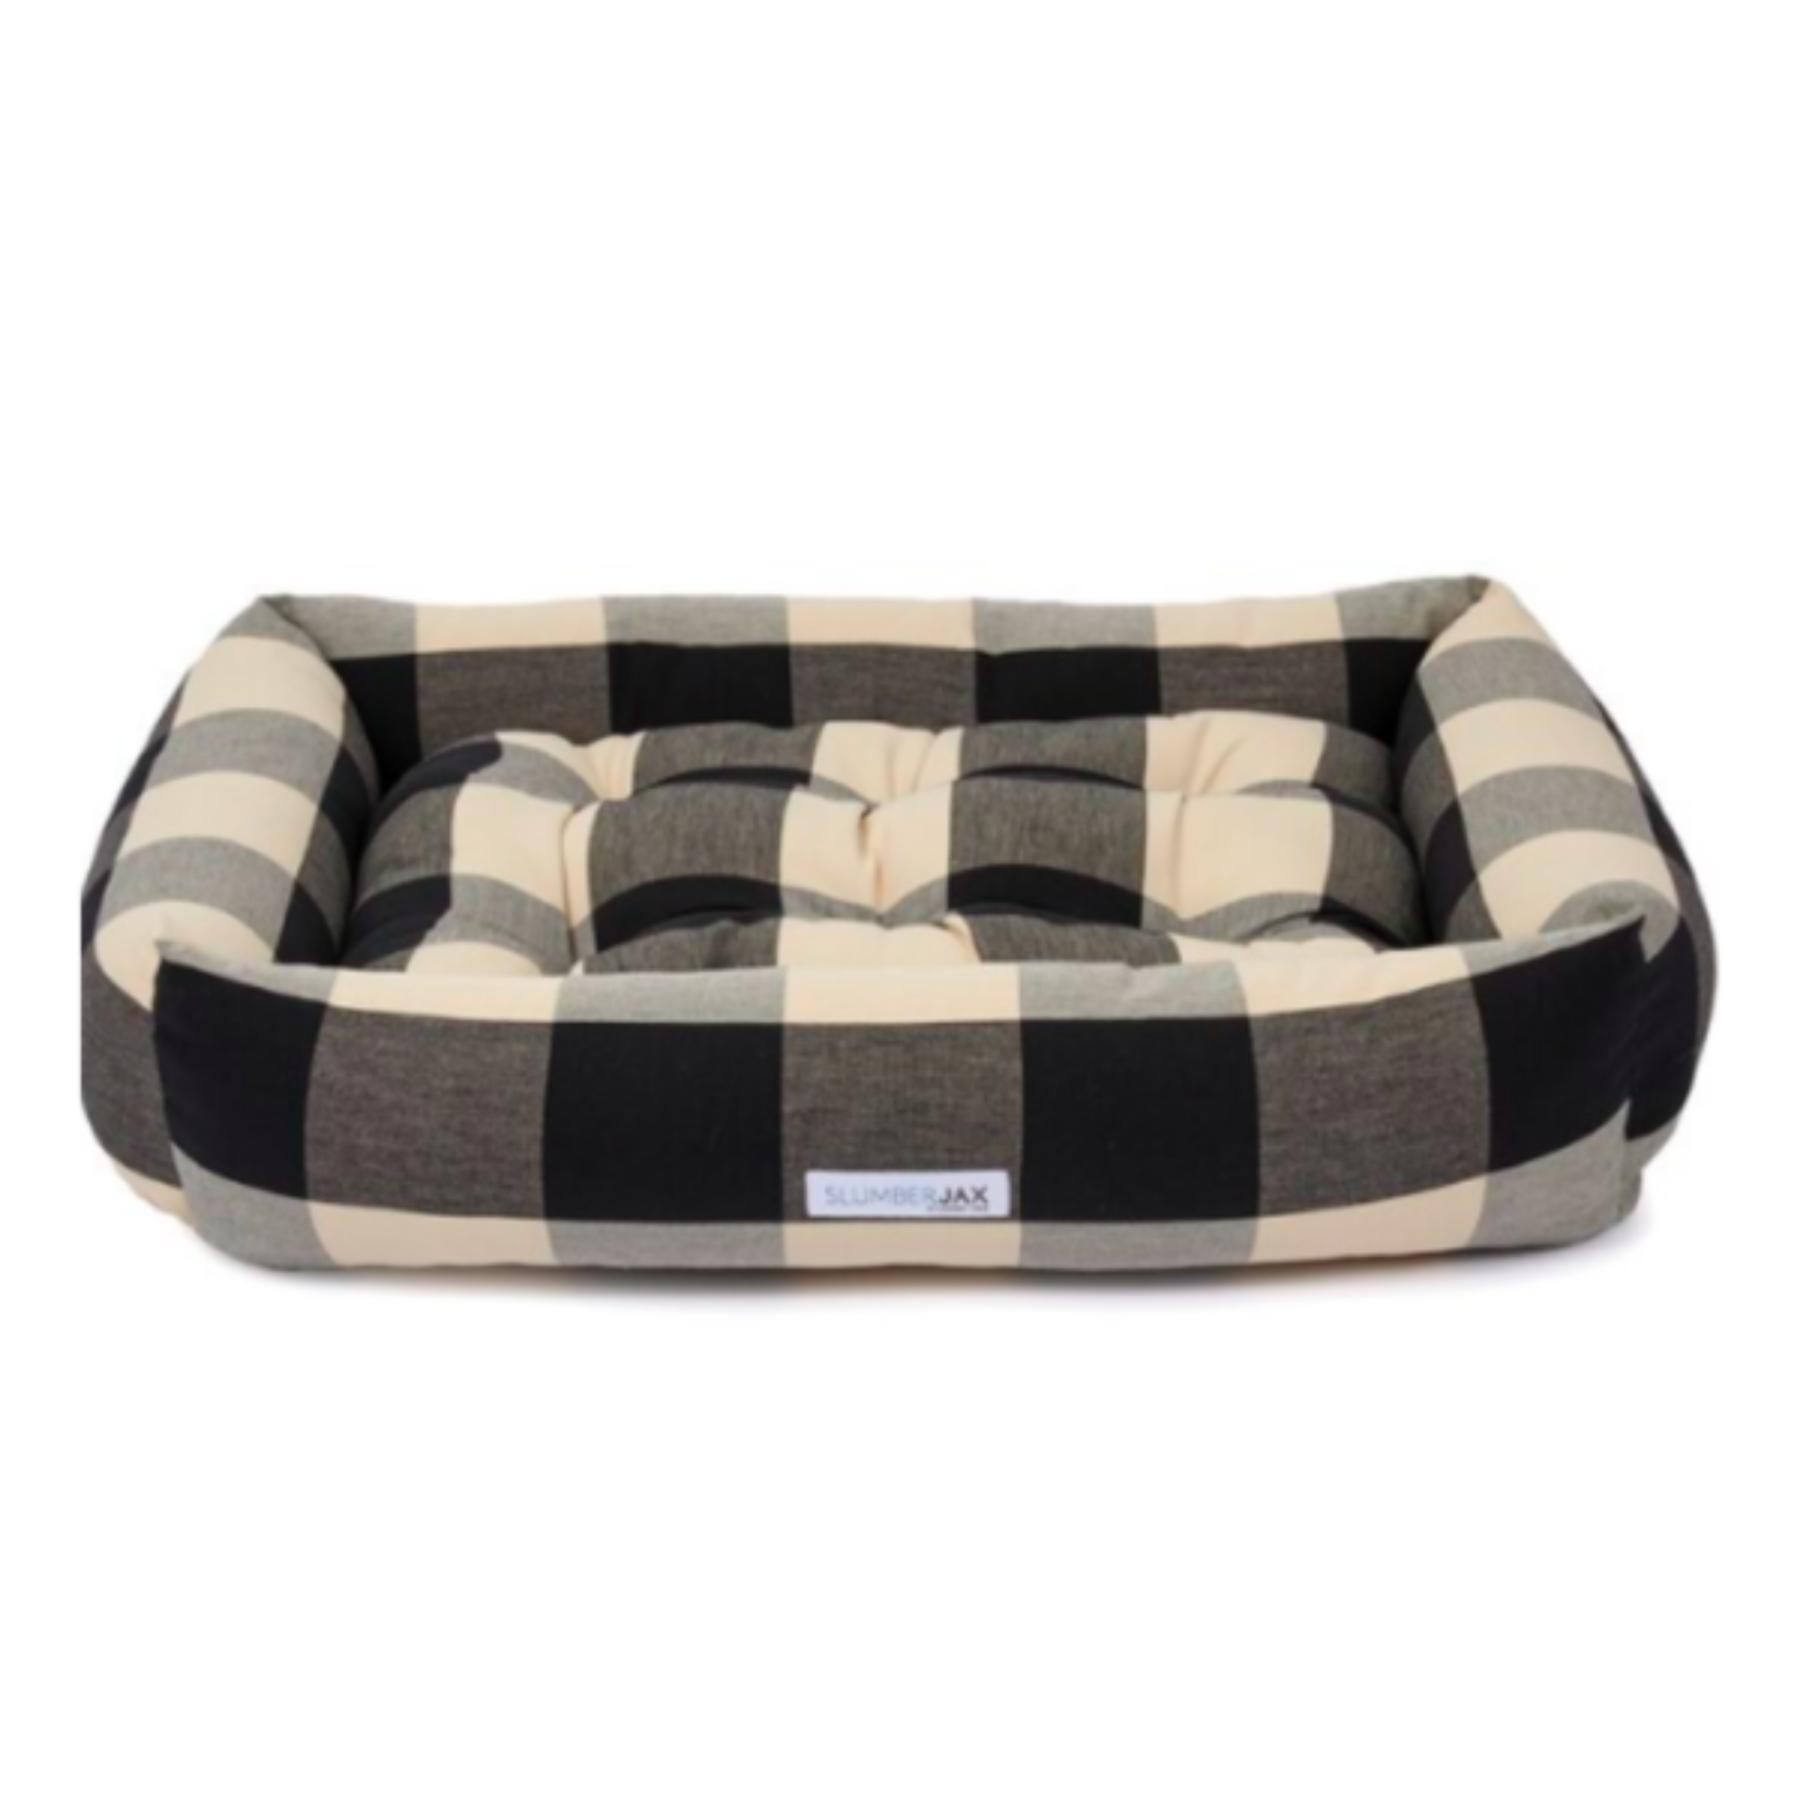 Buffalo check black and white dog bed